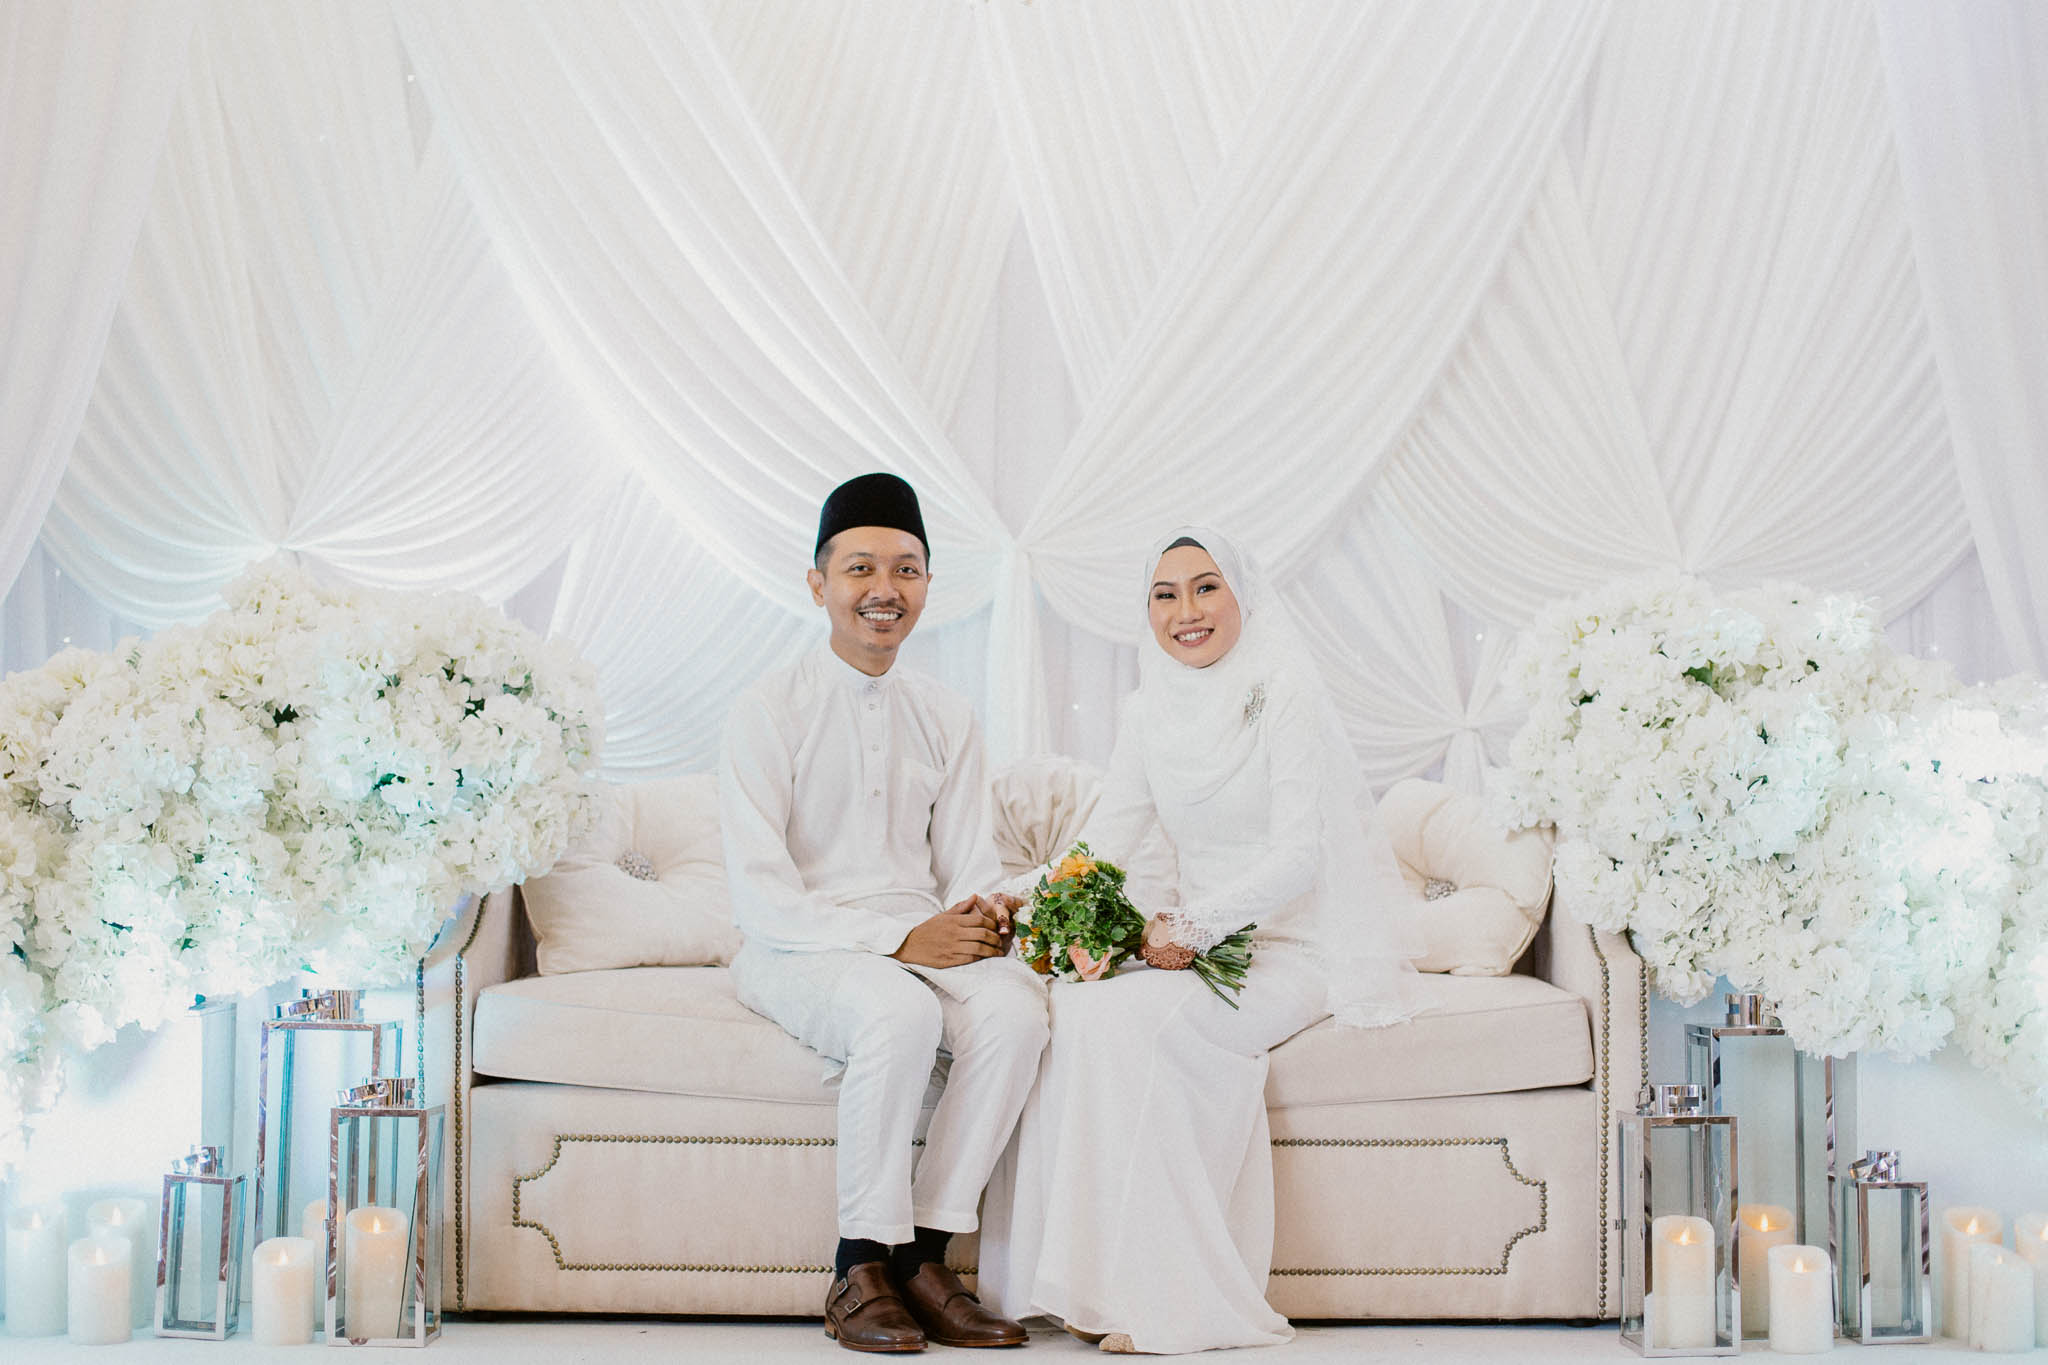 singapore-wedding-photographer-wedding-nufail-addafiq-035.jpg